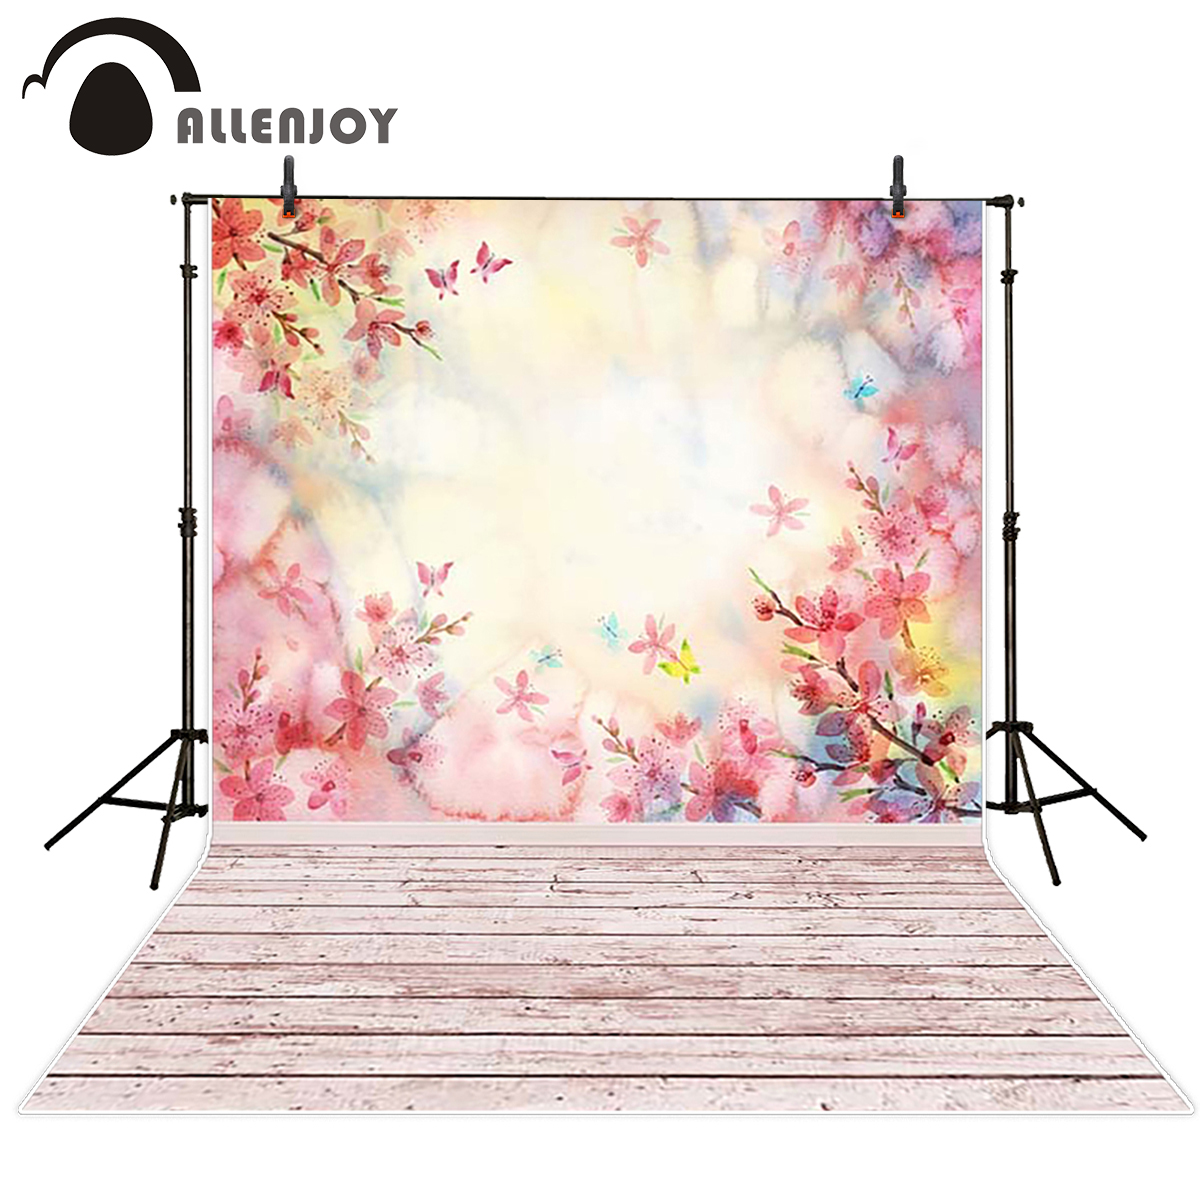 Allenjoy scenic Photo background Spring peach blossom pink gouache on wood board background vinyl photography backdrops vinyl abm sharif hossain and fusao mizutani dwarfing peach trees grafted on vigorous rootstocks